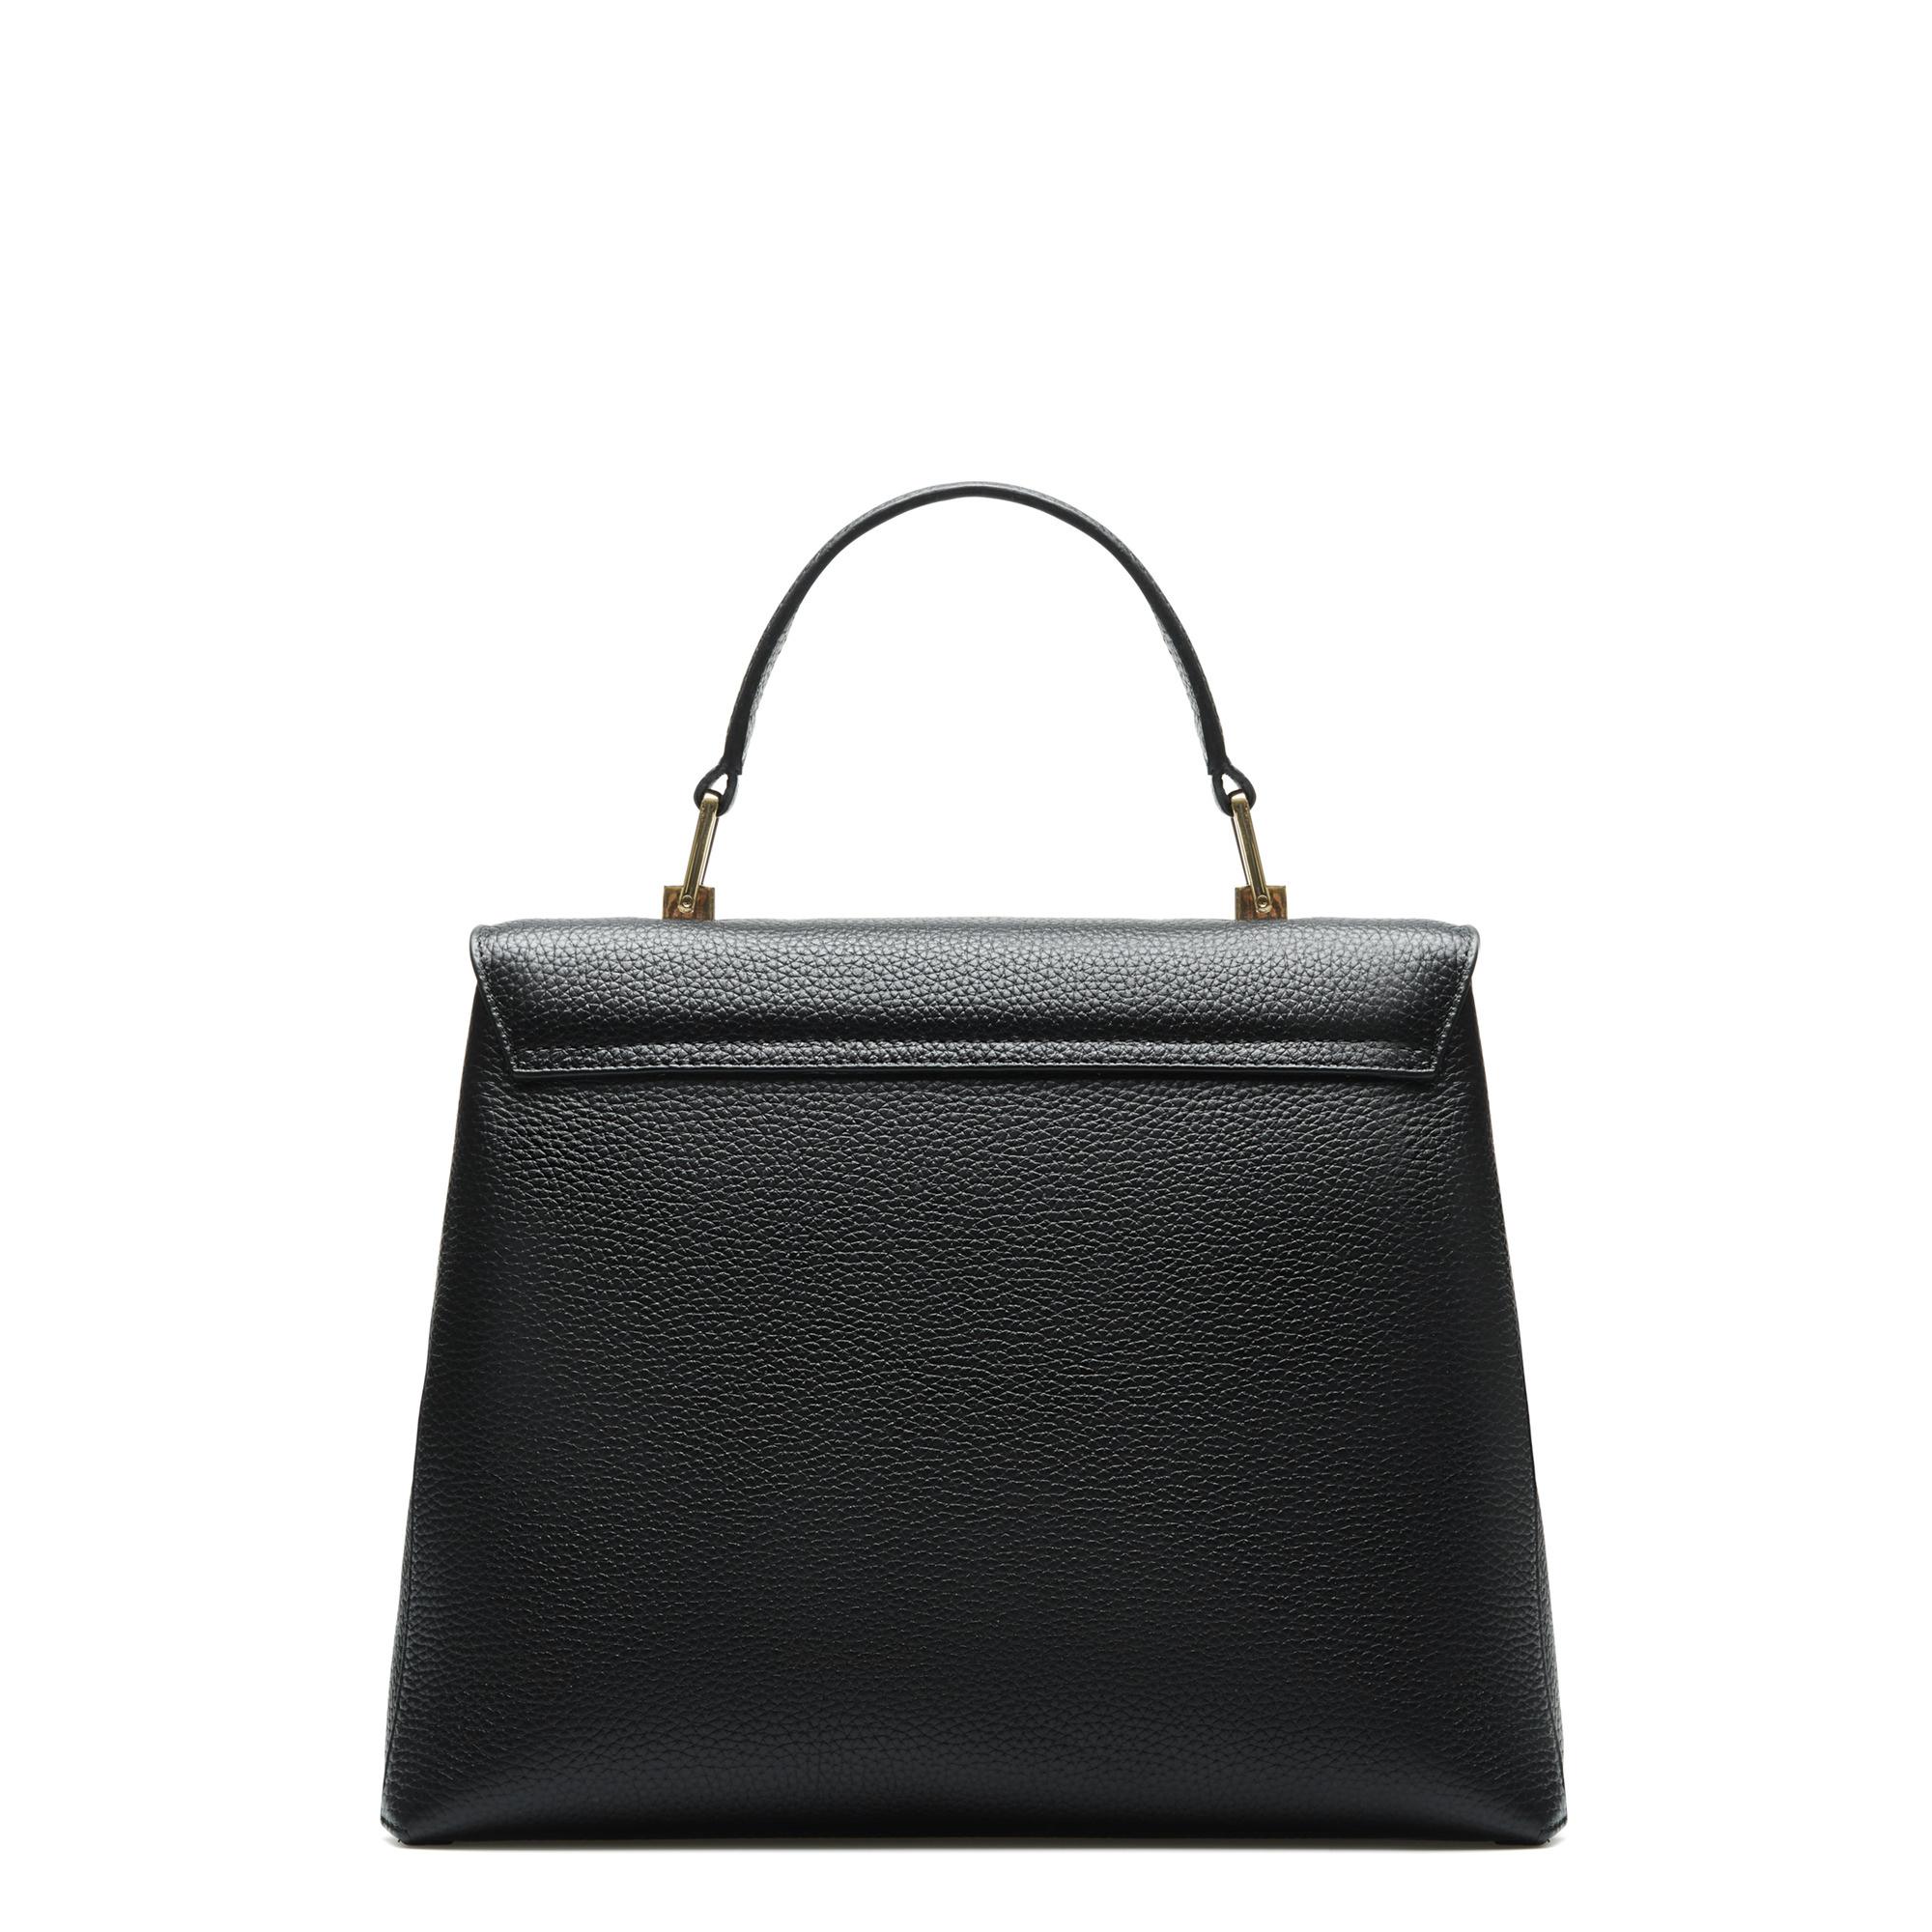 Isabel Bernard Femme Forte Gisel svart läder handväska av kalvskinn